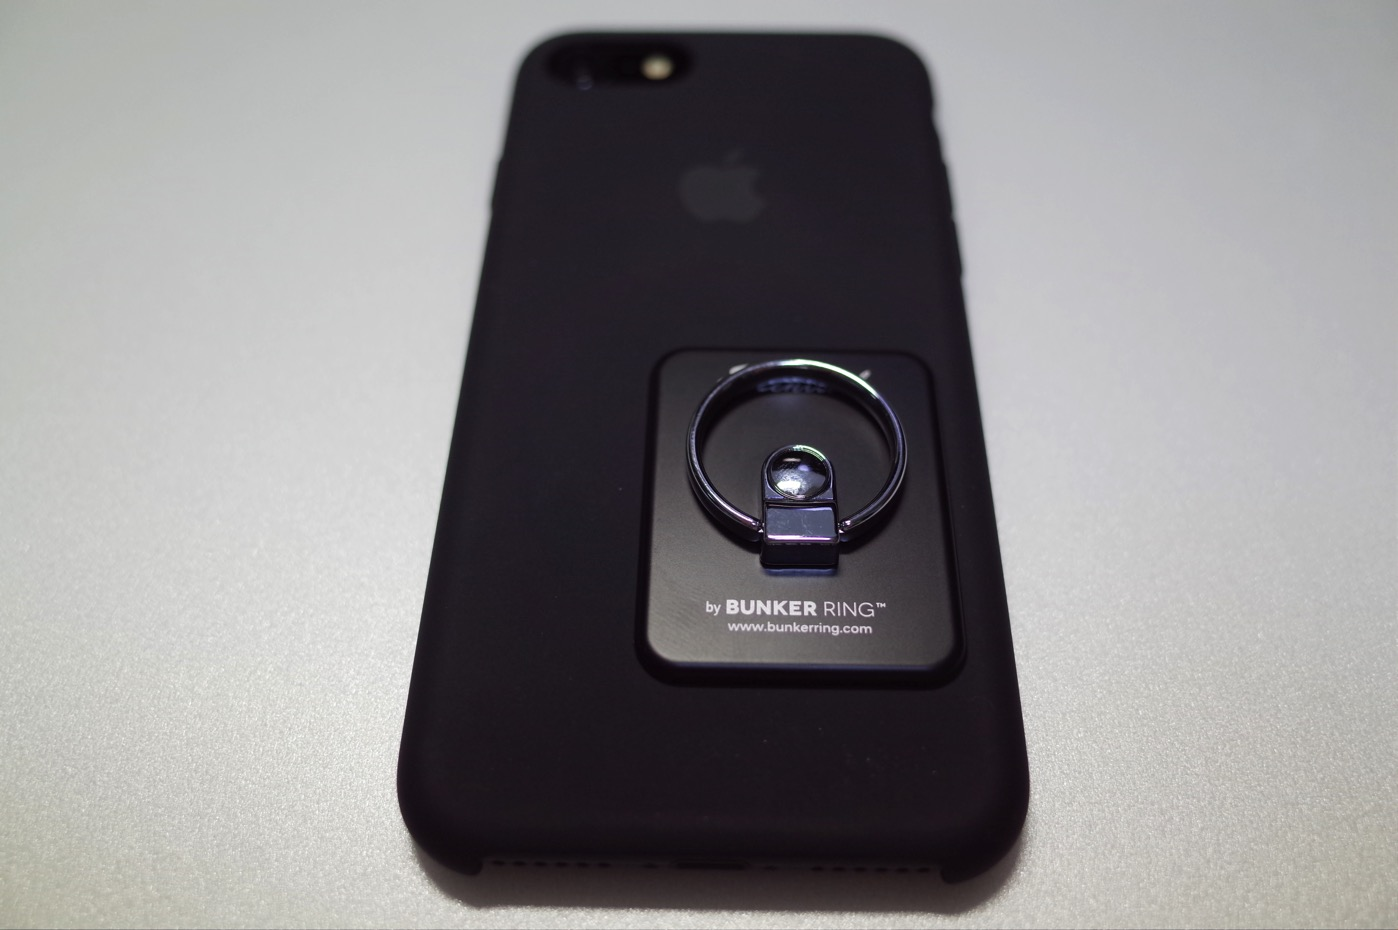 [iPhone]iPhone 7 を片手で快適に操作できるよう耐久性抜群のバンカーリング(Bunker Ring)を購入したよ